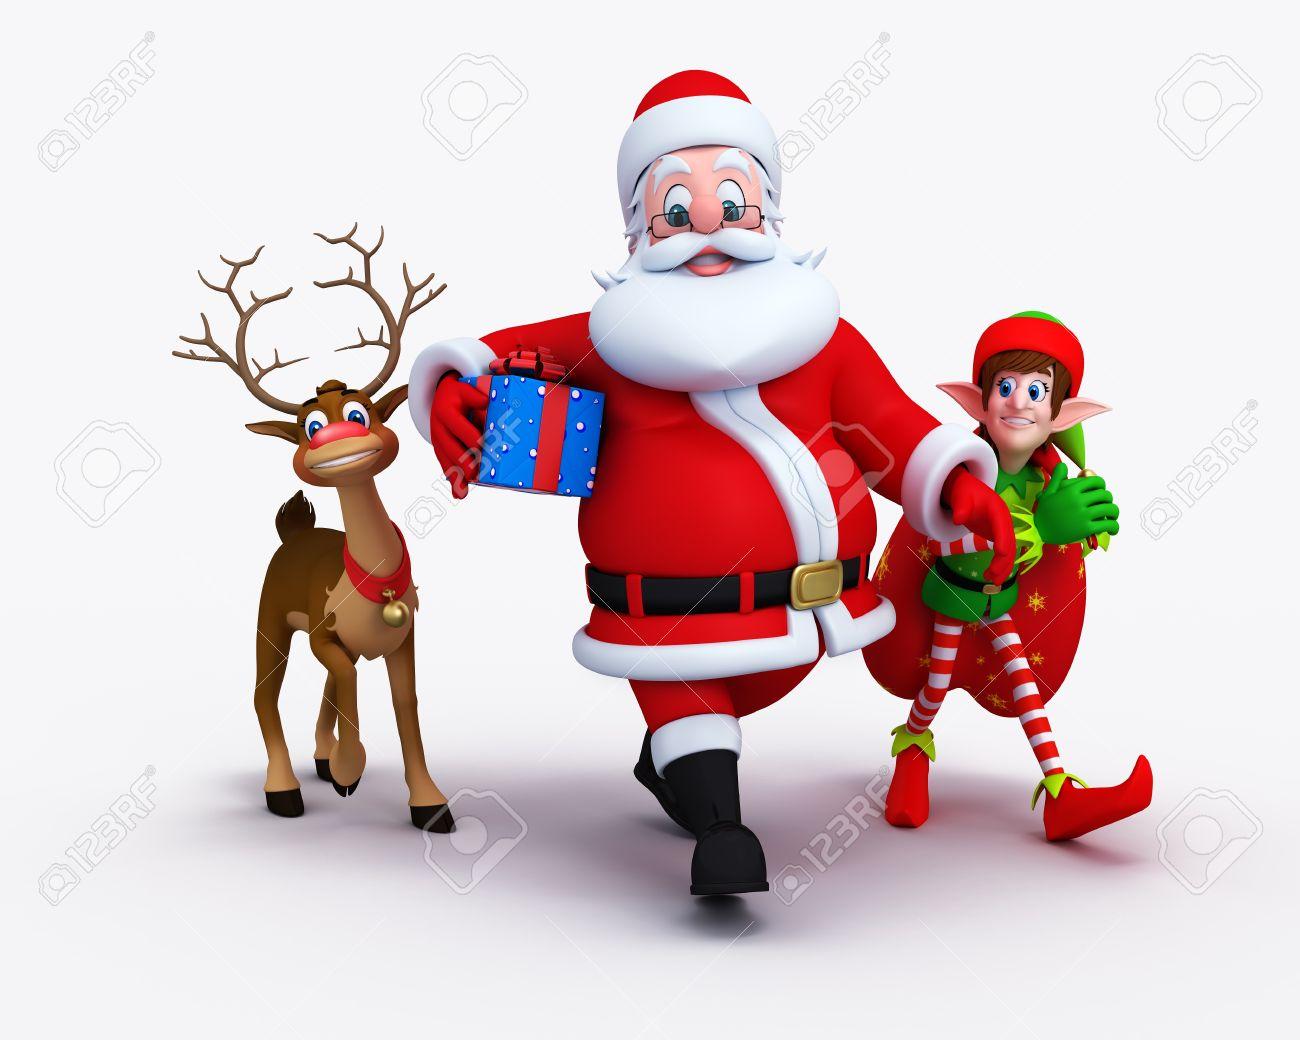 santa is walking with naughty reindeer and elves stock photo